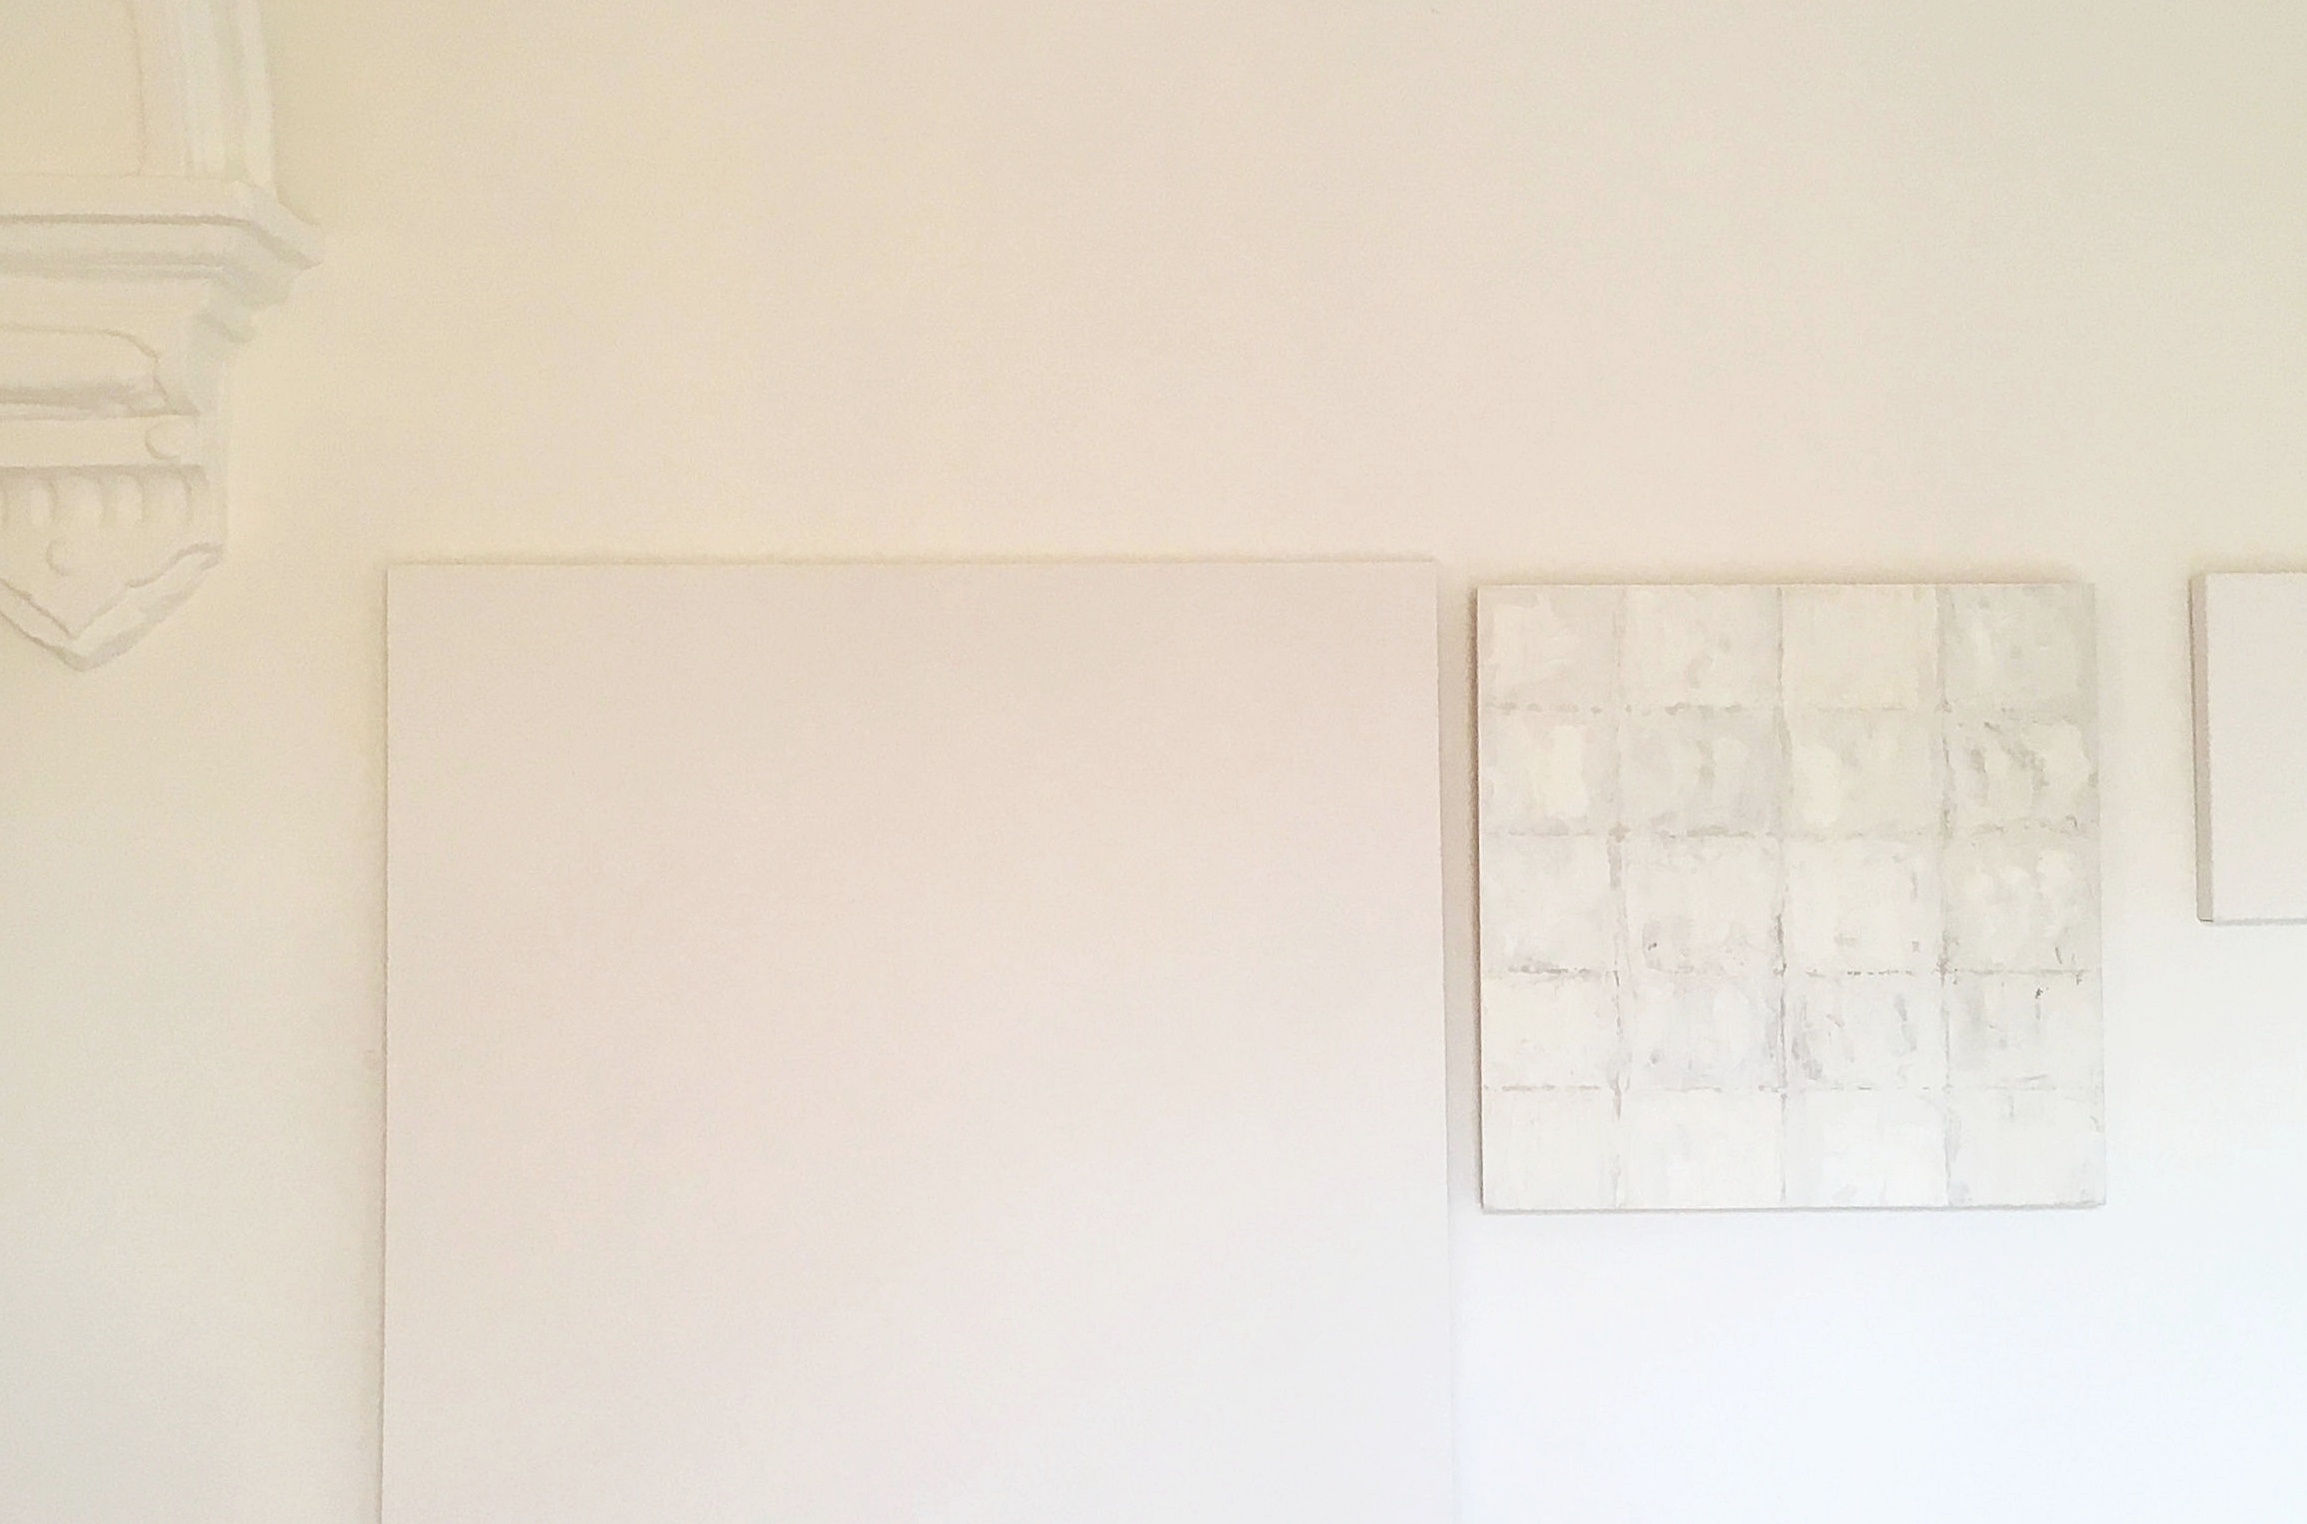 Twilight Textures - Interior Design - Space is Obsolete